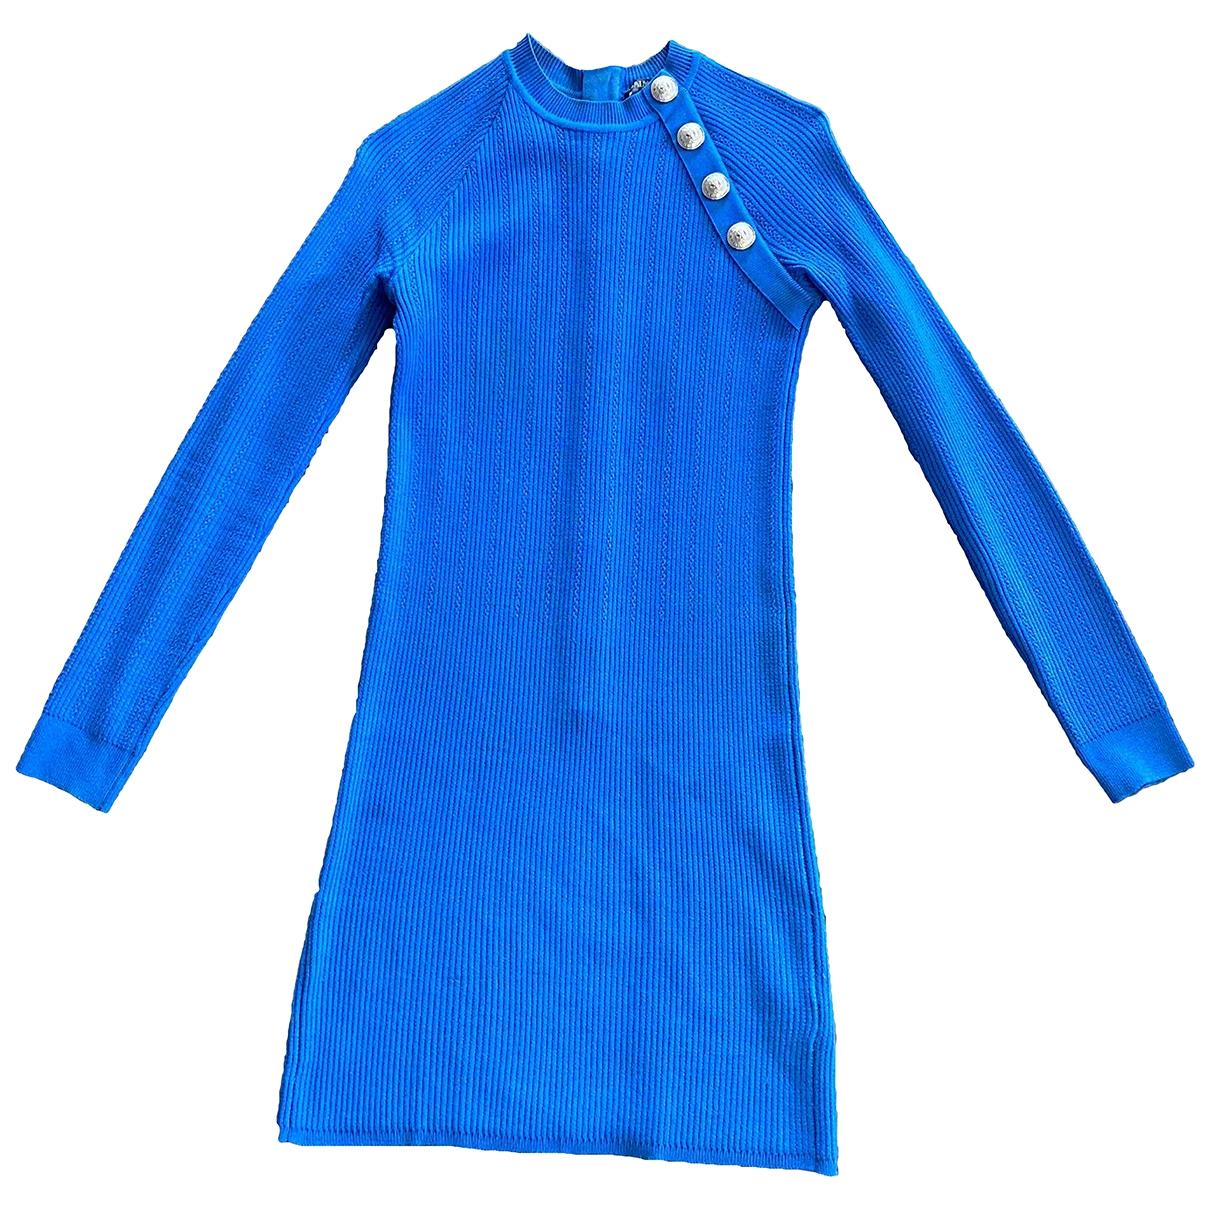 Balmain \N Blue dress for Women 38 FR